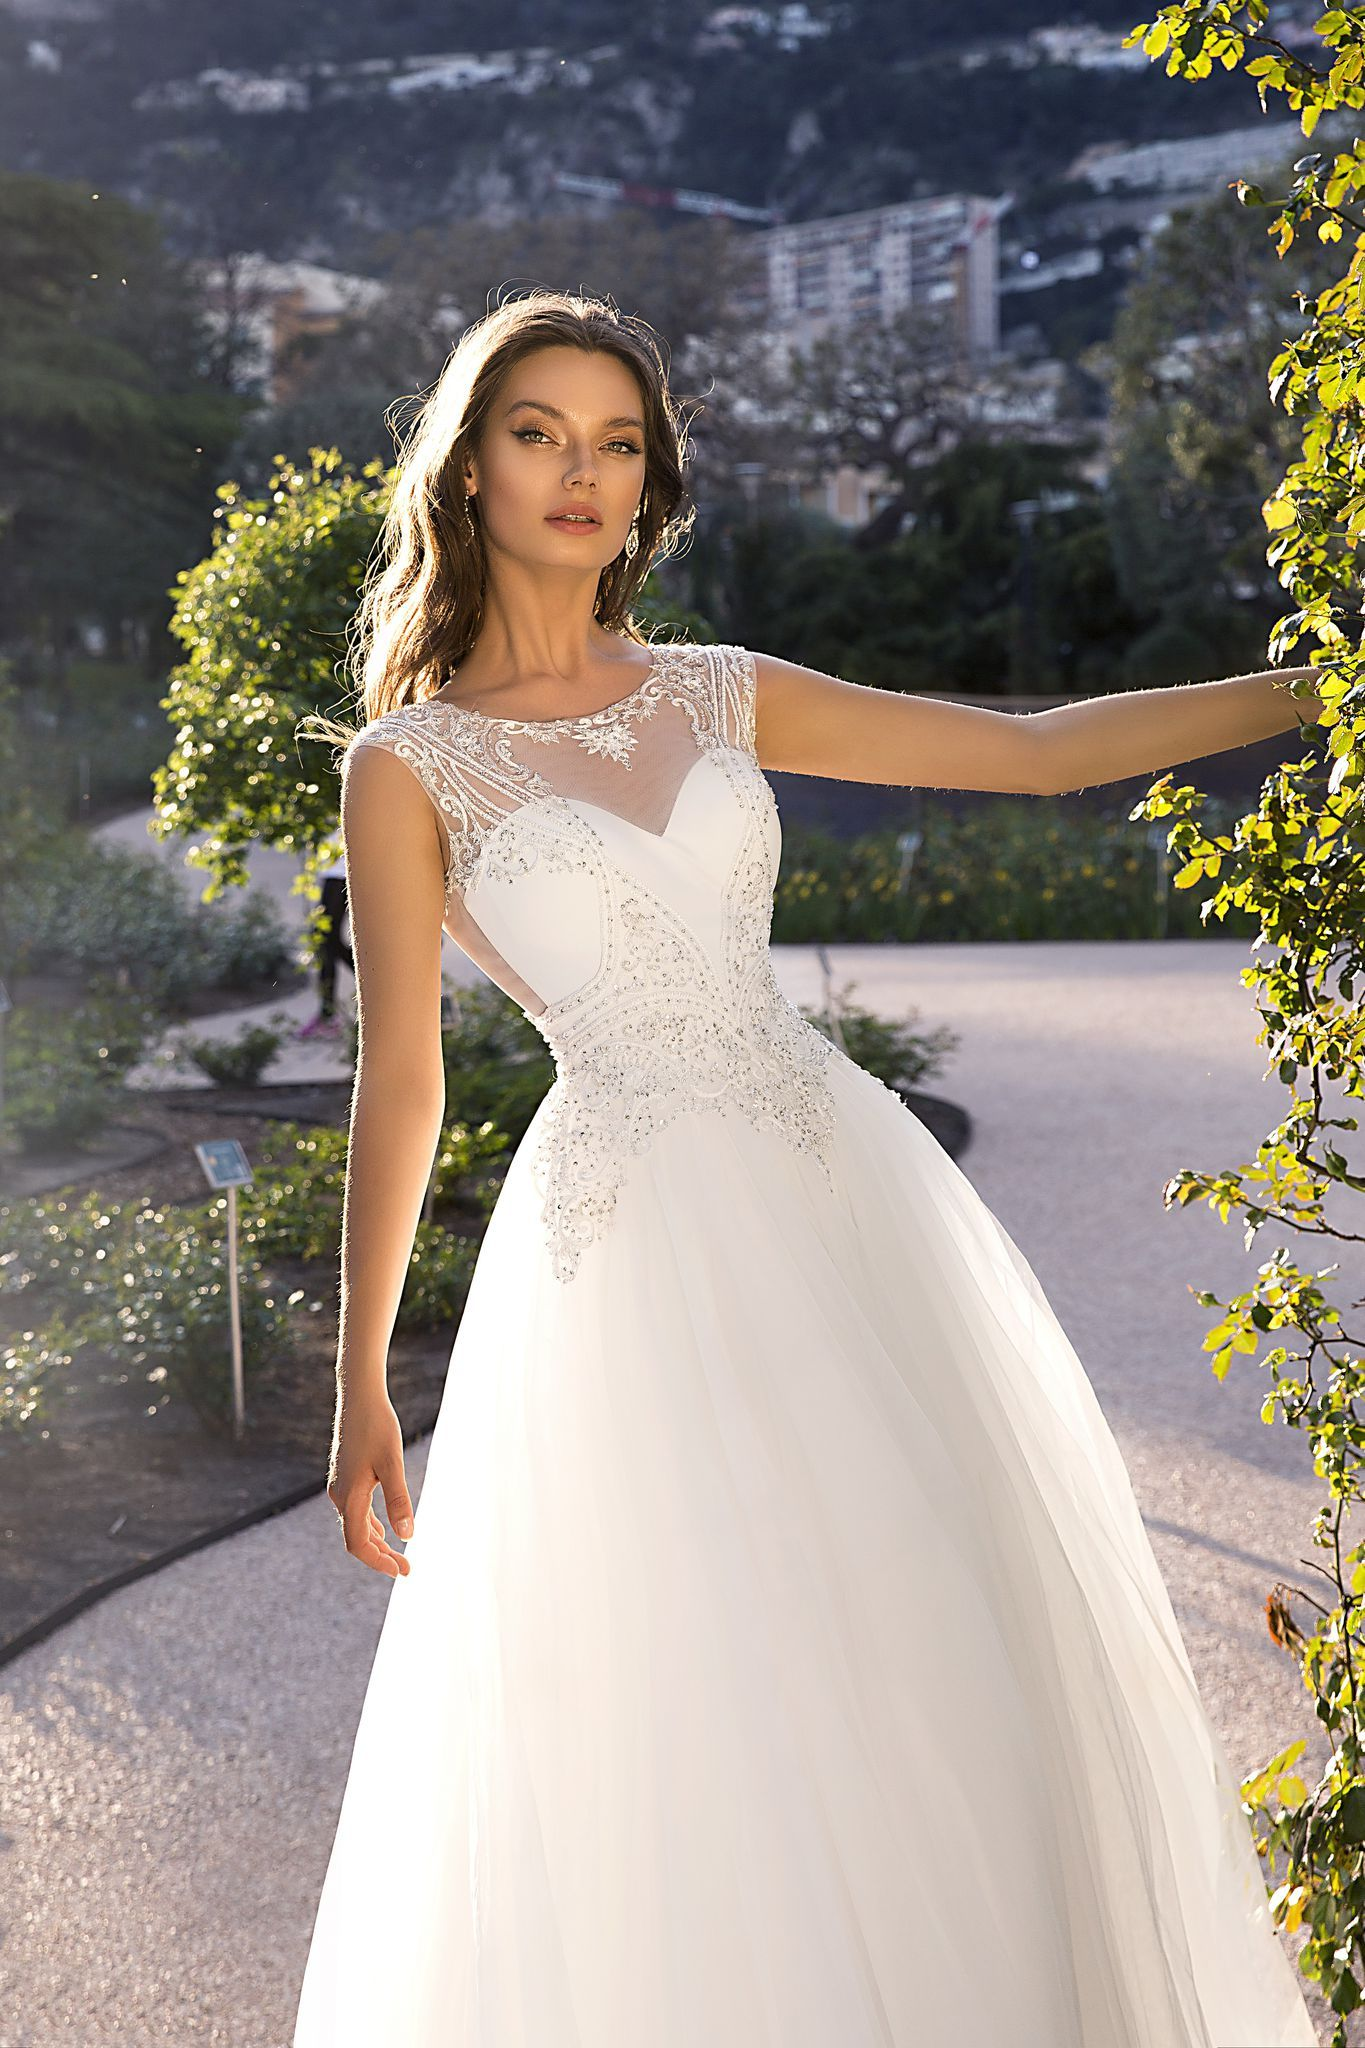 Wedding Dress Scarlett Katalog Stranica Tovara Tina Valerdi Wedding Dress Accessories Wedding Dresses Wedding Dress Store